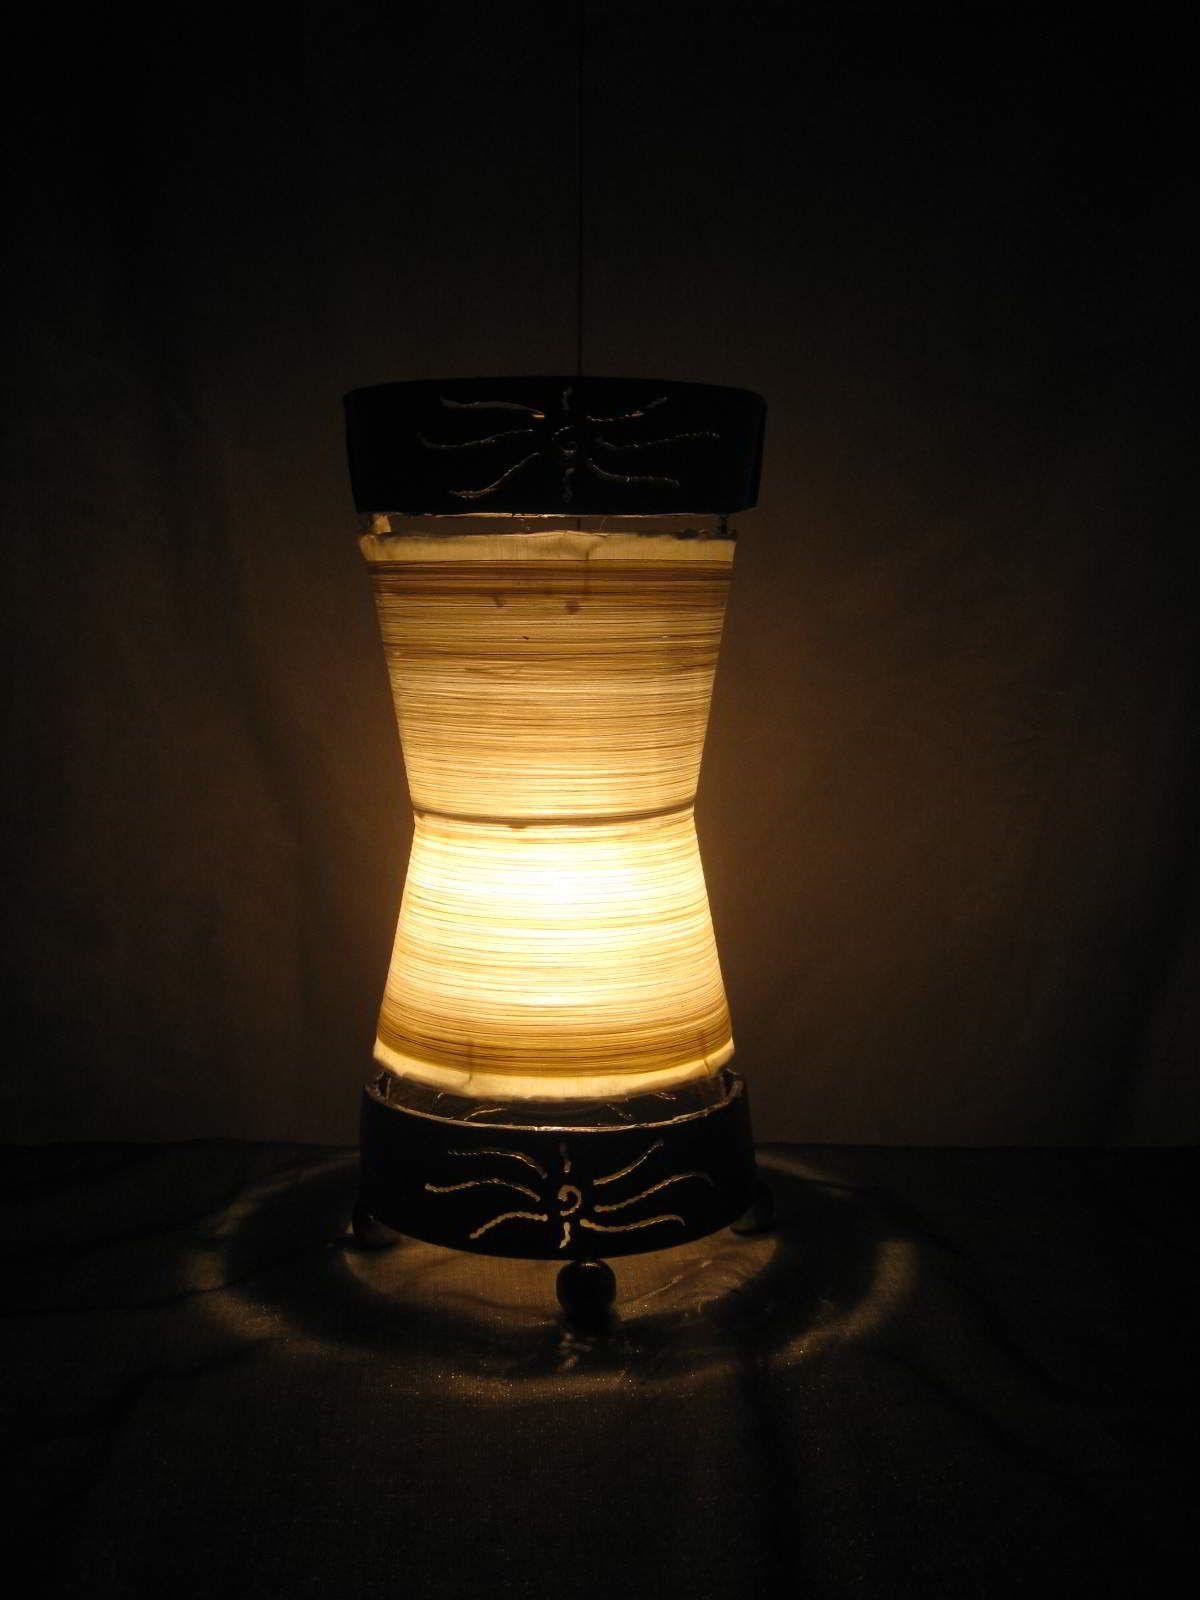 Lampade design,lampade da arredo,lampade moderne, abat